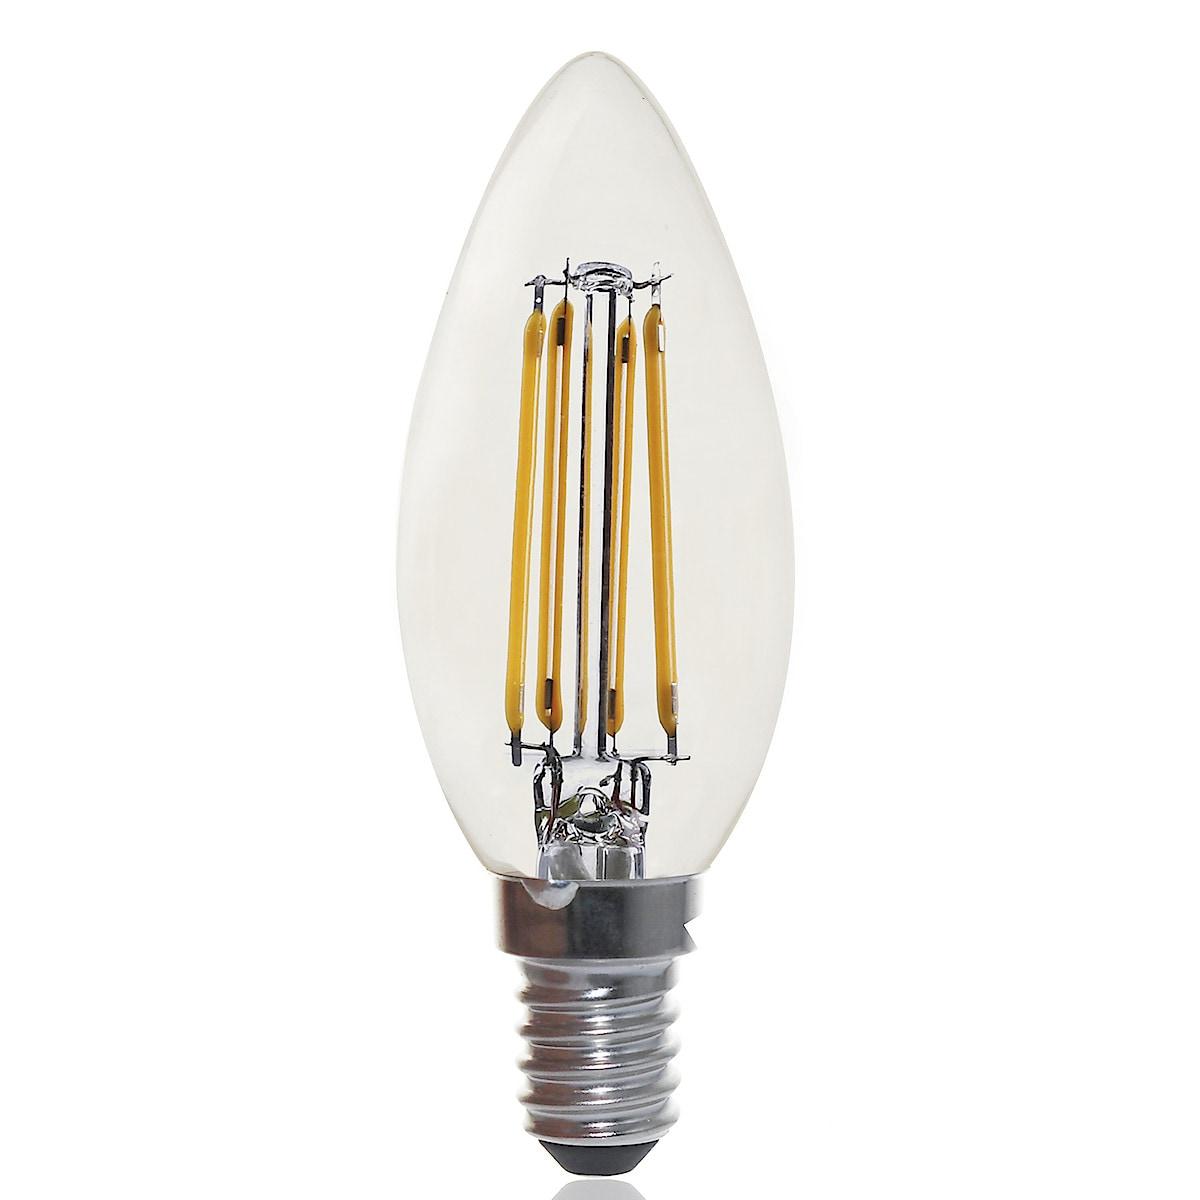 Clas Ohlson Premium Classic dimbar LED-pære E14 mignon